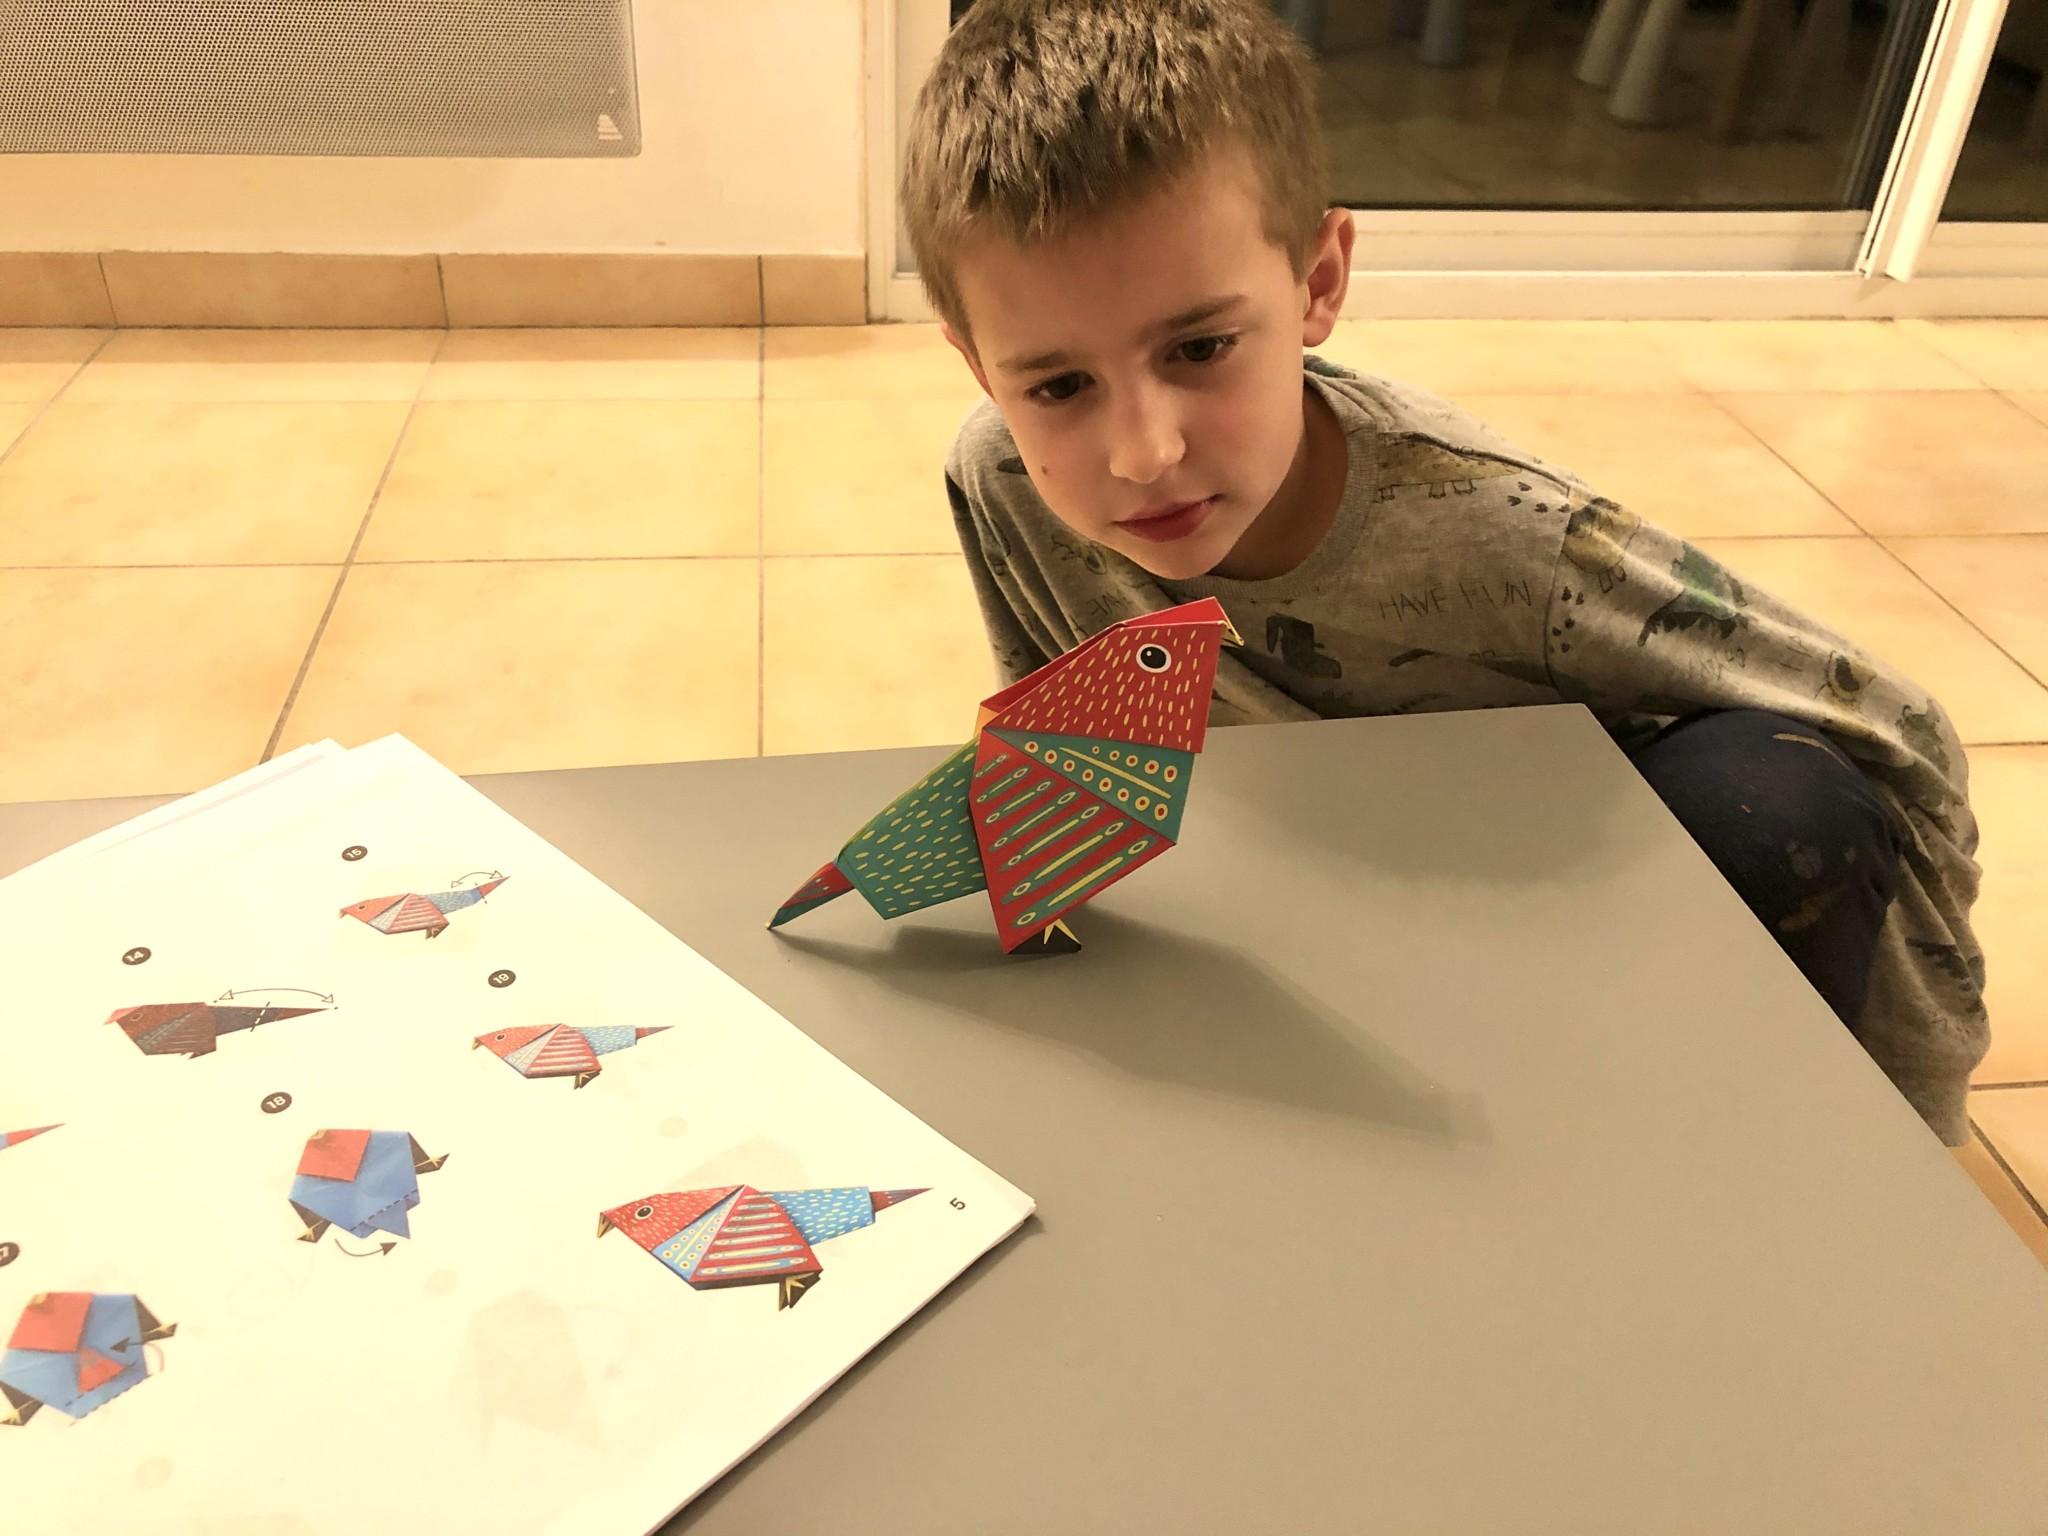 On teste les oiseaux en origami de chez Joli Origami